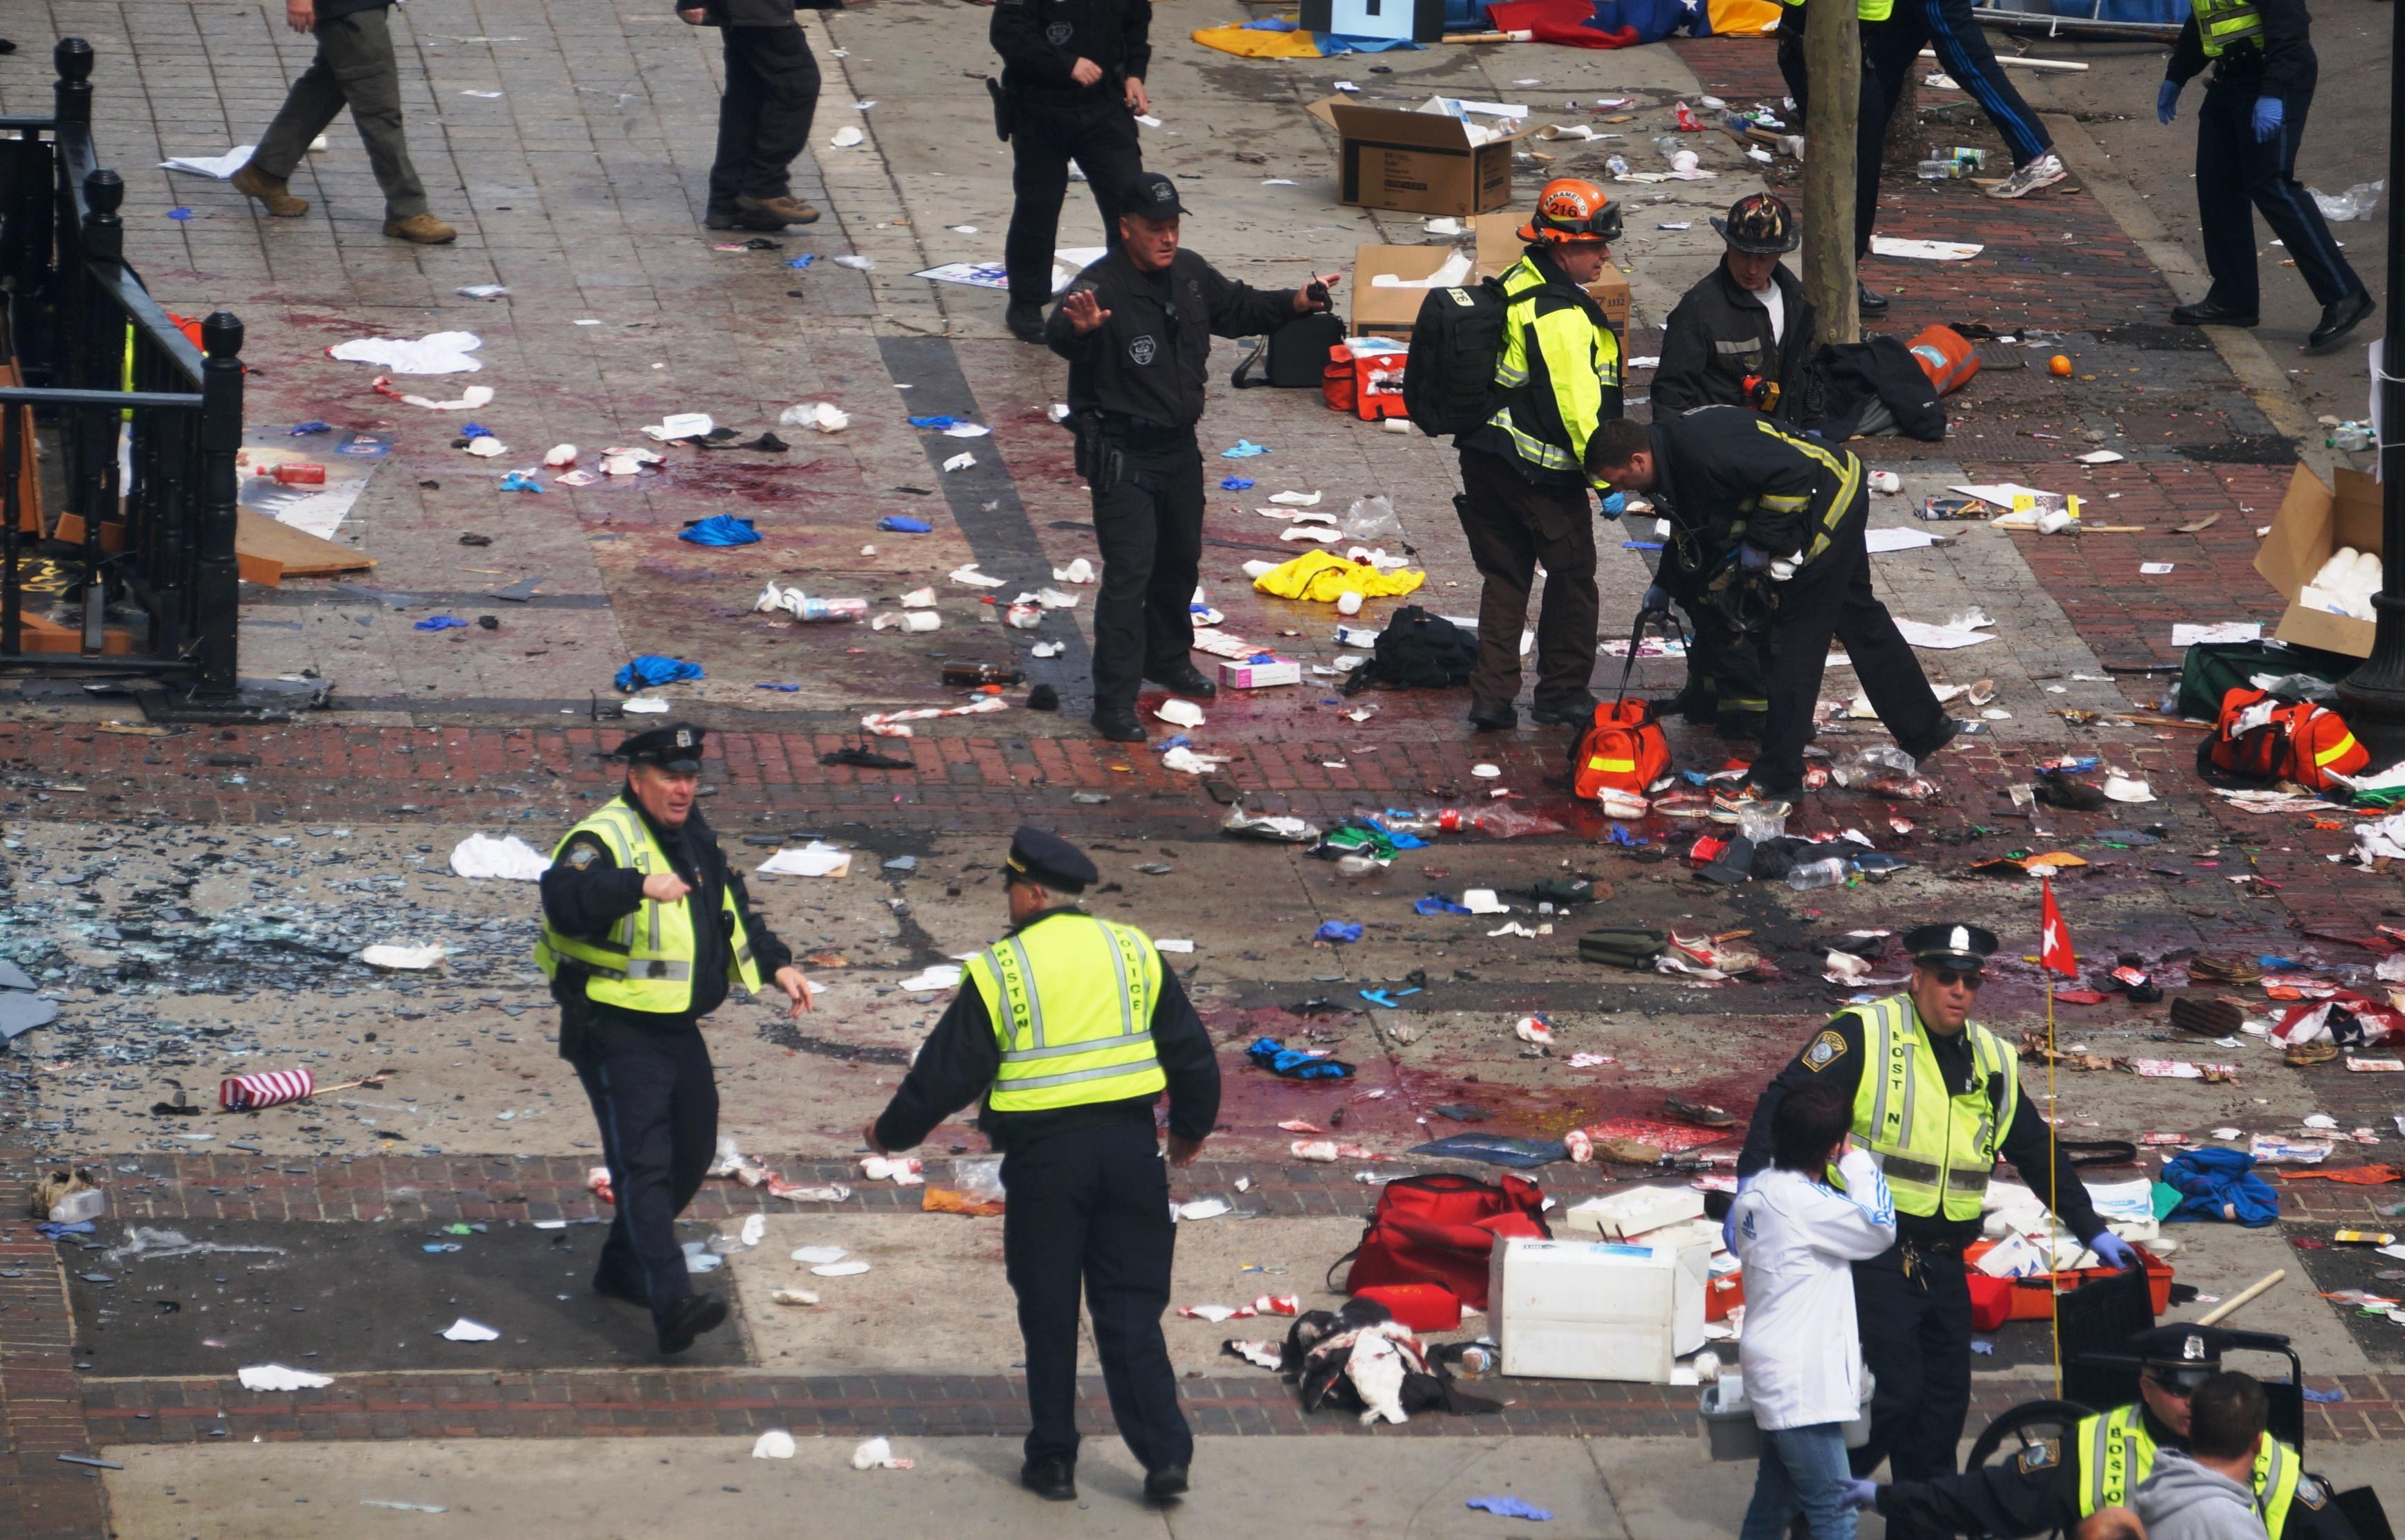 Image of Boston Marathon bomb site